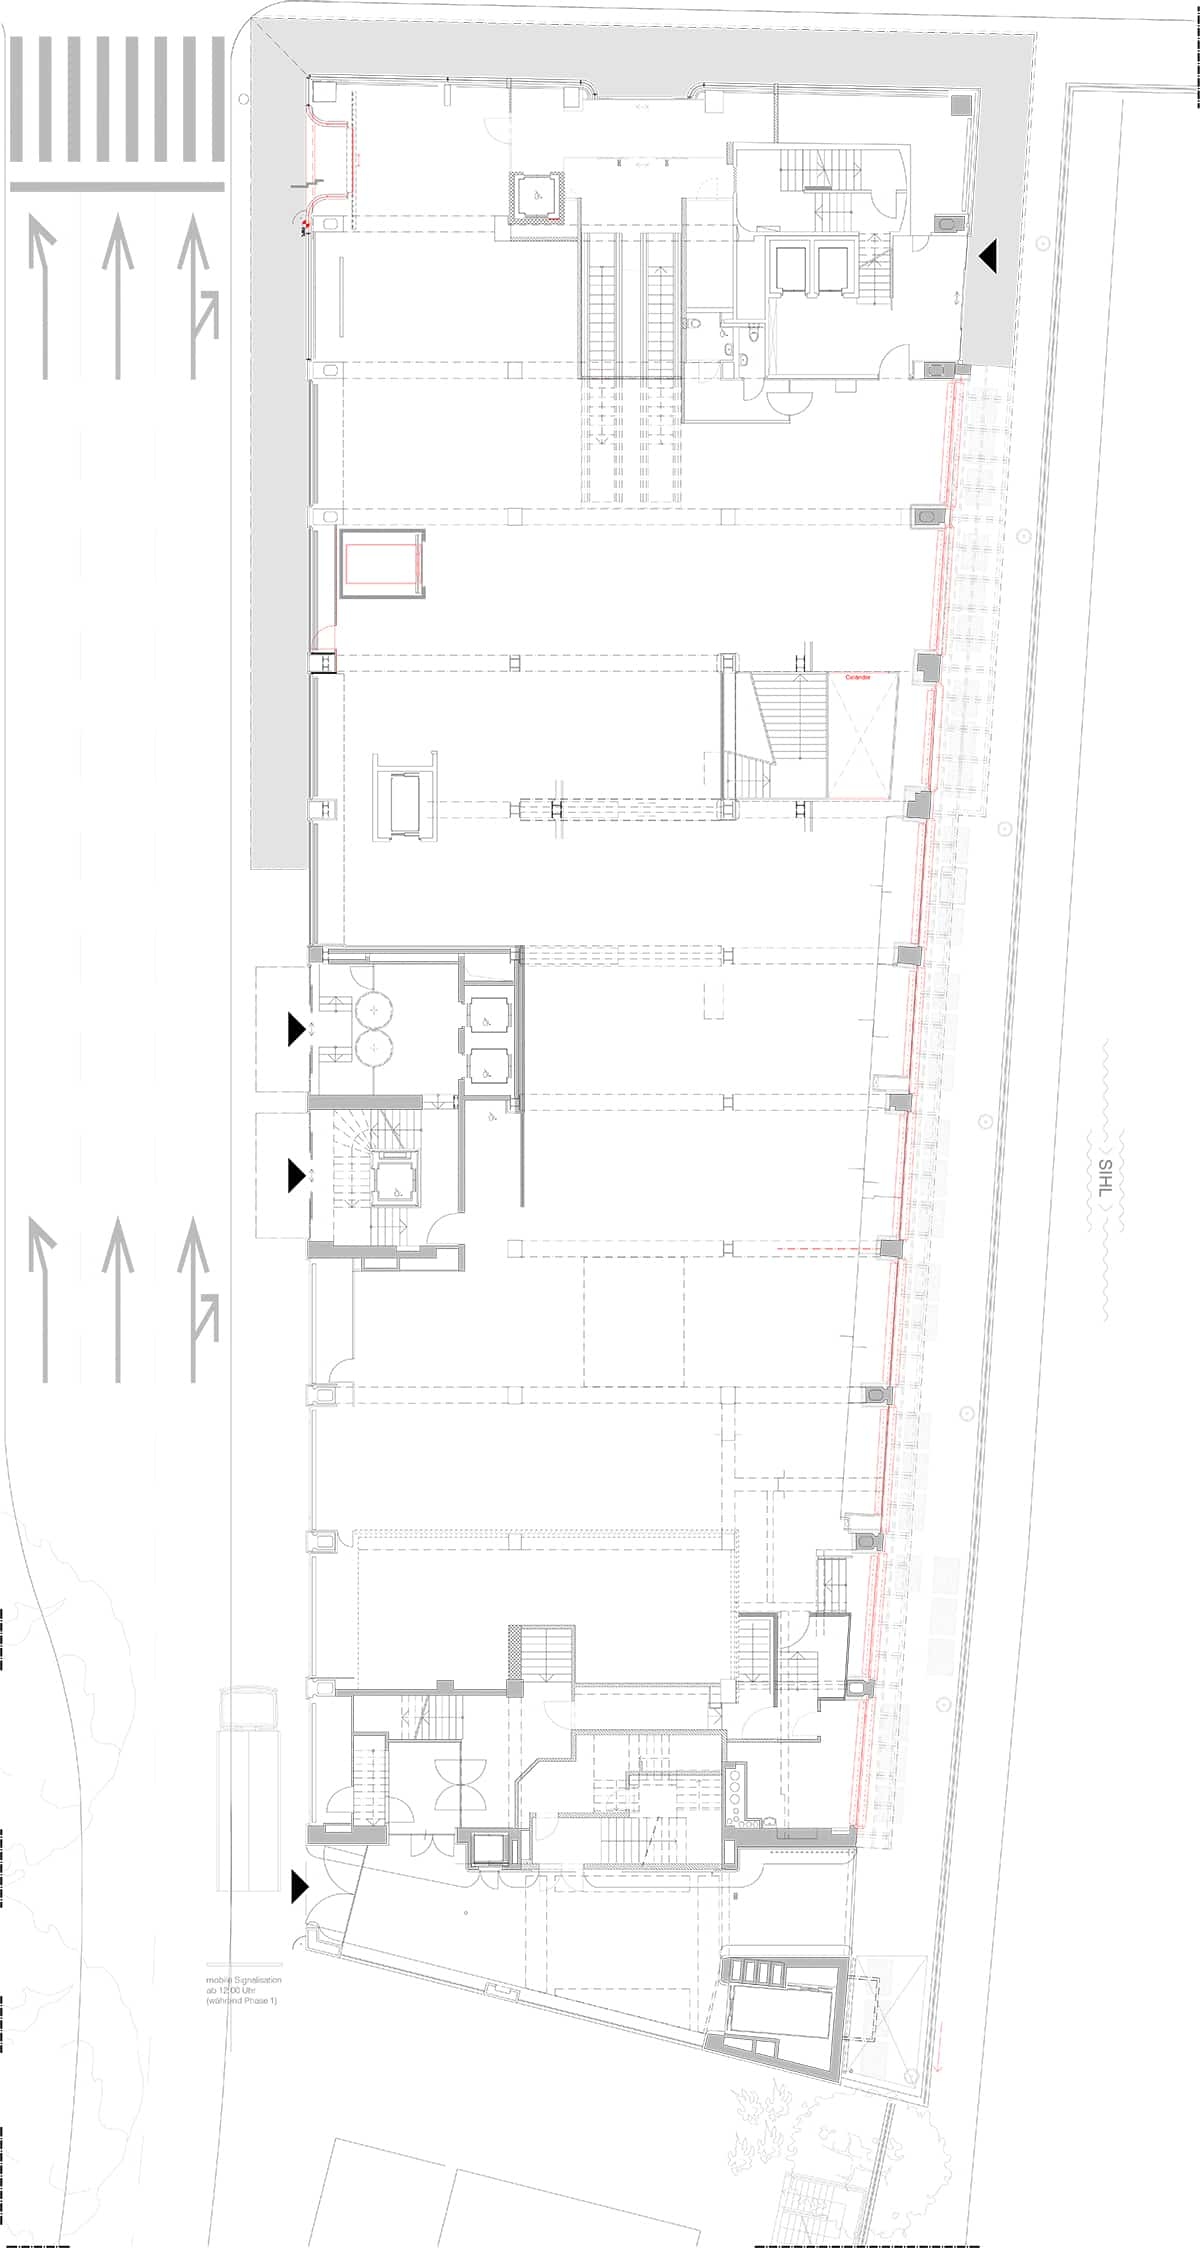 Rückbau Athleticum Haus Ober Plan